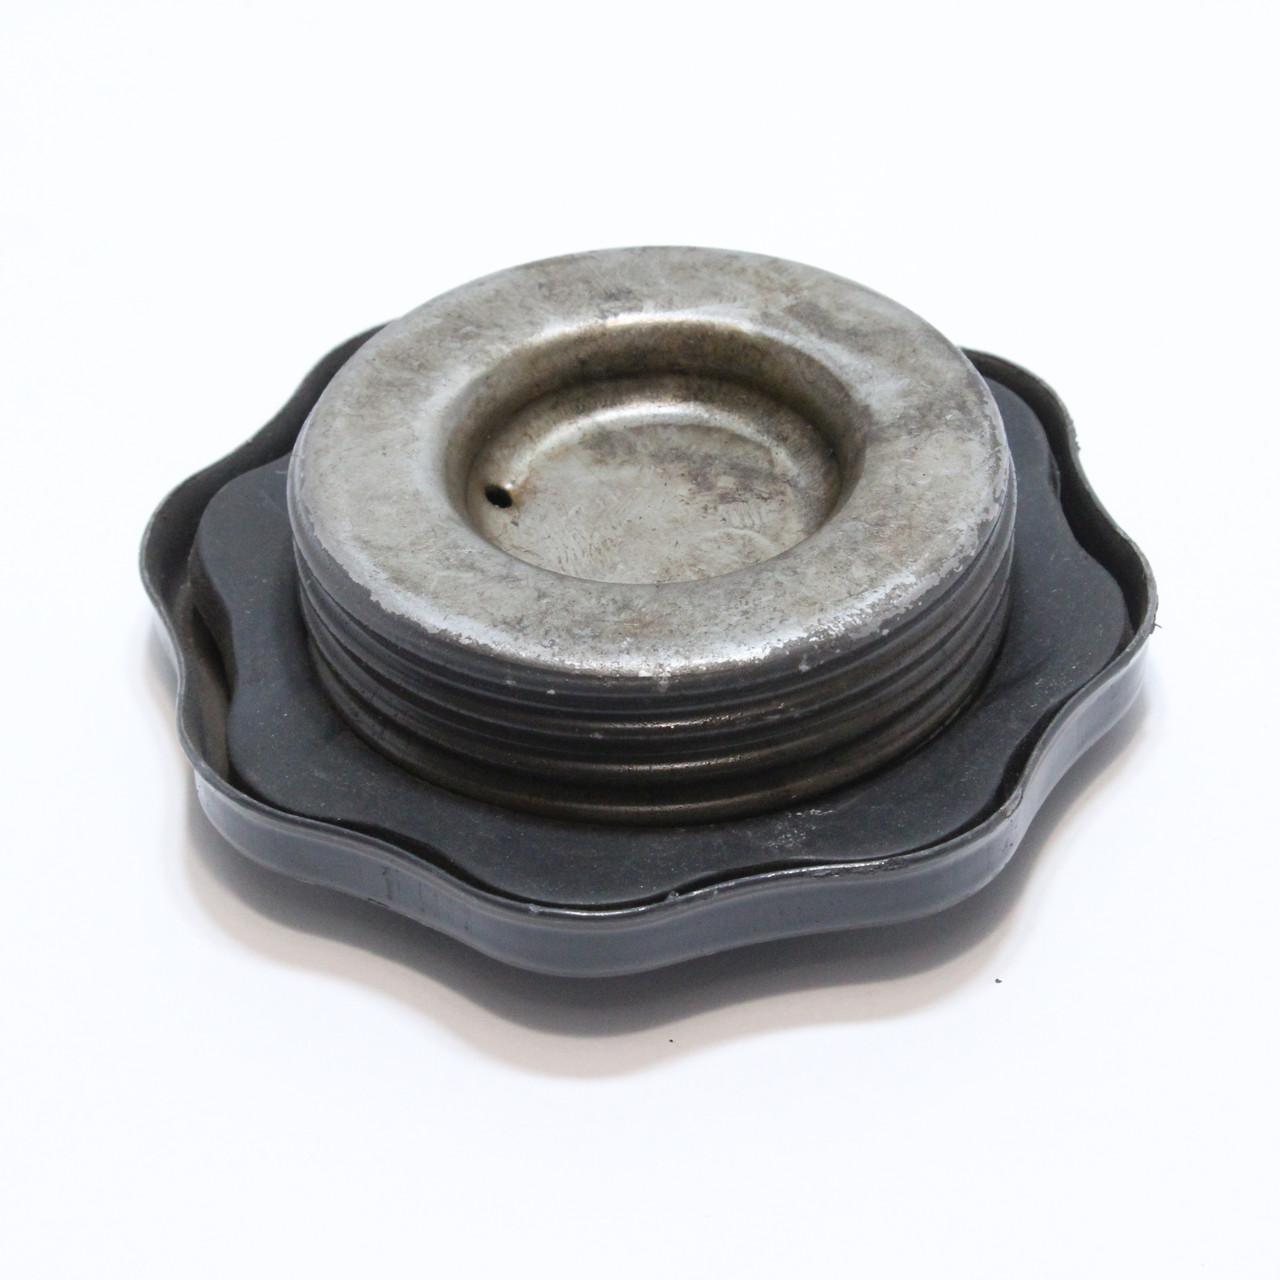 Крышка топливного бака Т-150, ЮМЗ, Т-16, Т-40 74.50.042-4